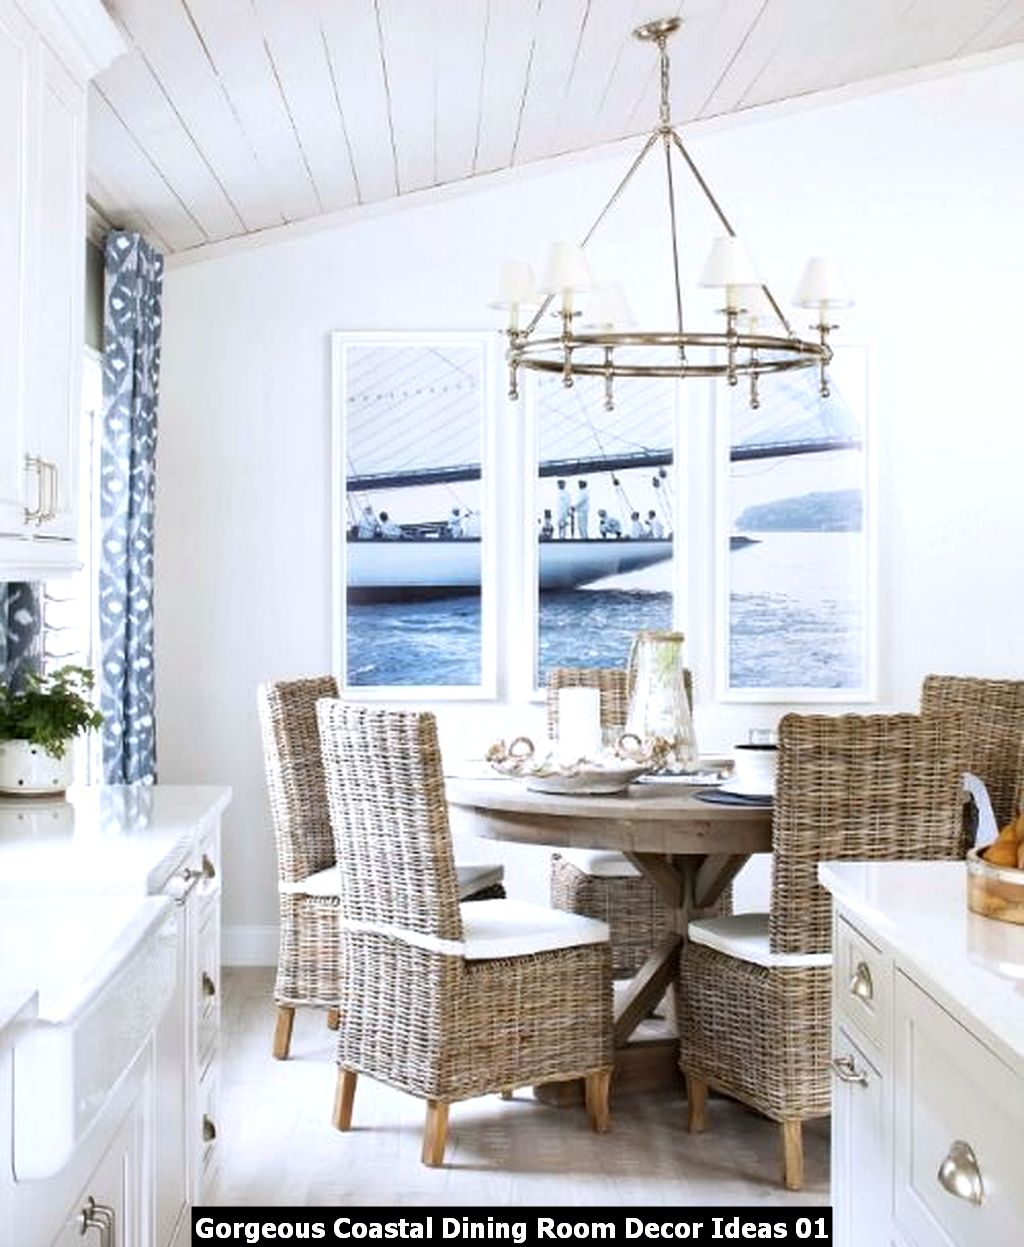 Gorgeous Coastal Dining Room Decor Ideas 01